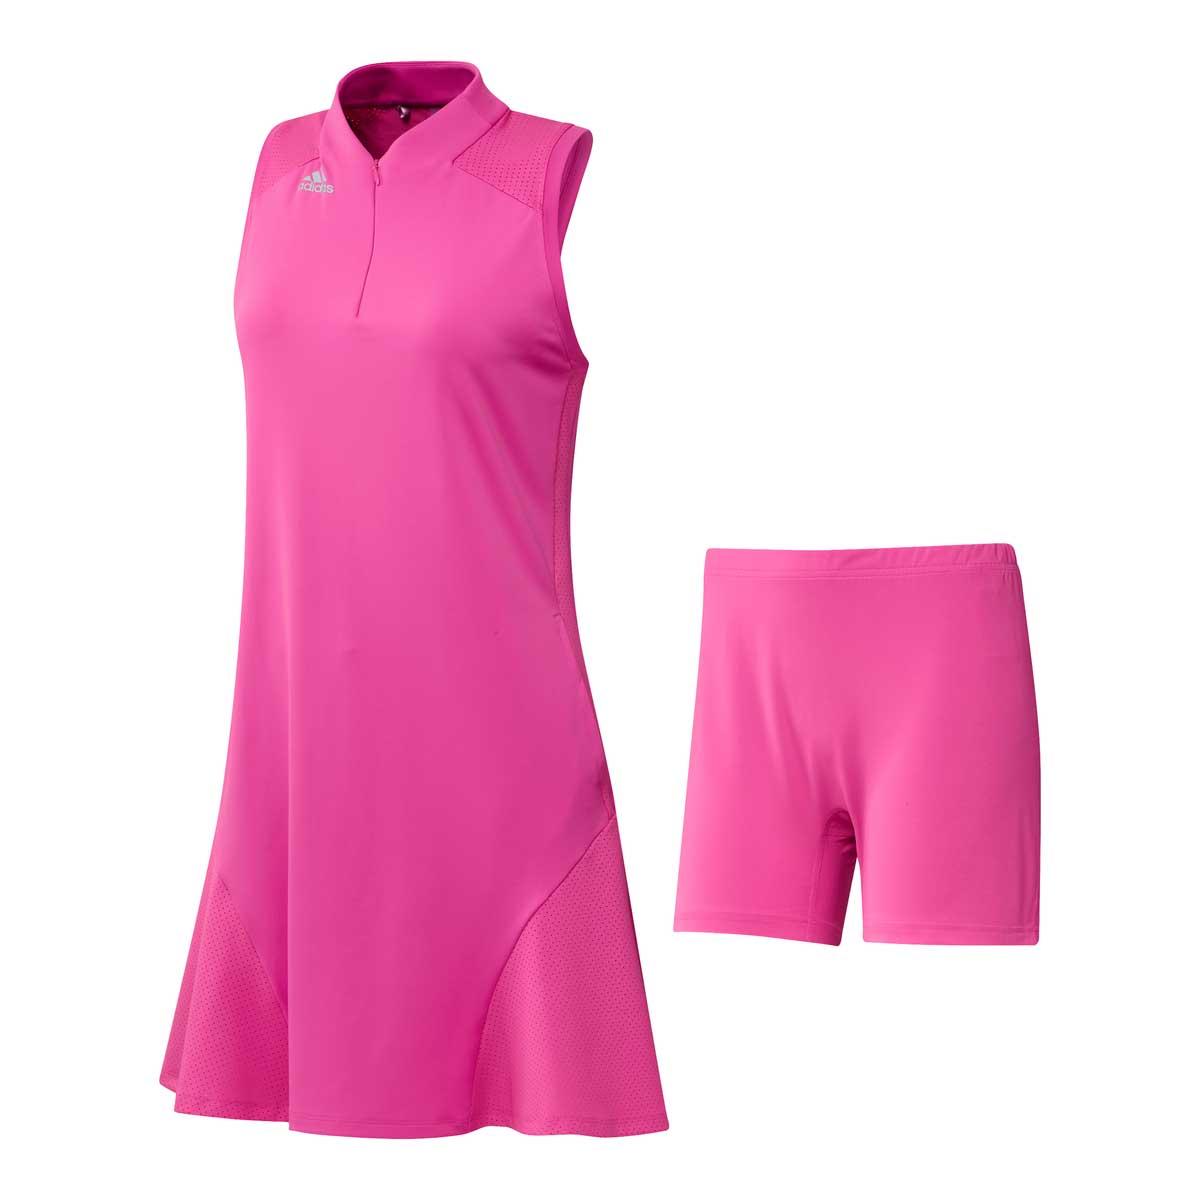 Adidas Women's Aeroready Sport Performane Screaming Pink Dress